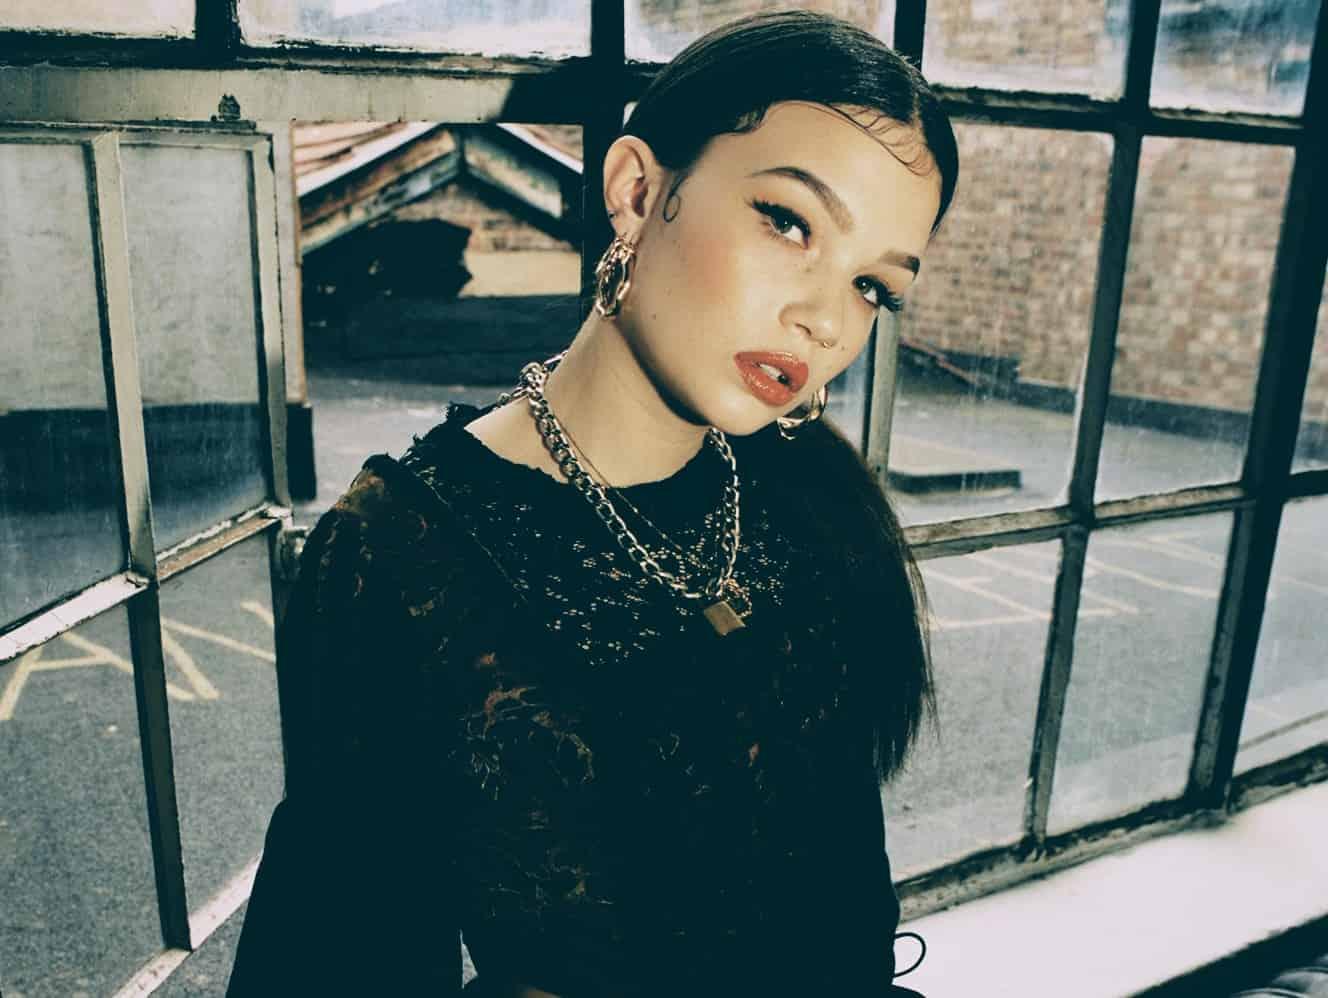 Lola Young Musician Biography